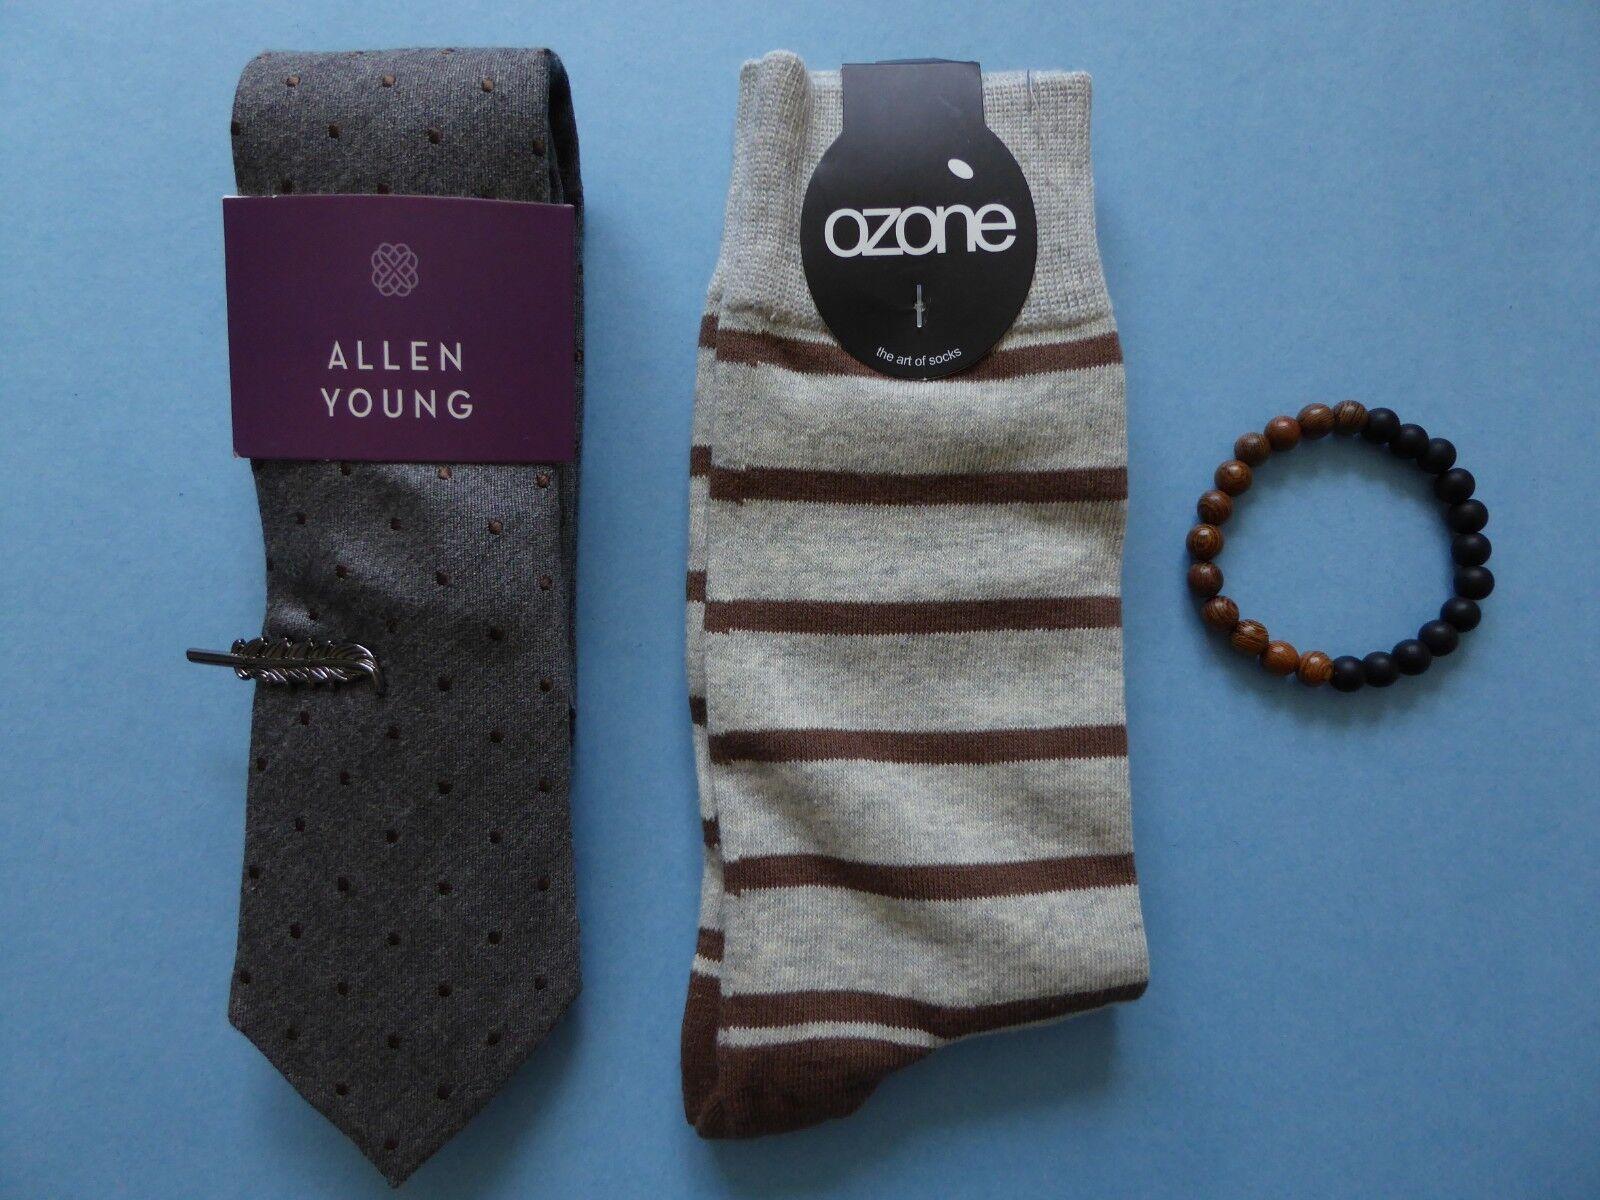 Allen Young Gray Dots Tie + Ozone Striped Sock + Tie Clip + Tropicalia Bracelet